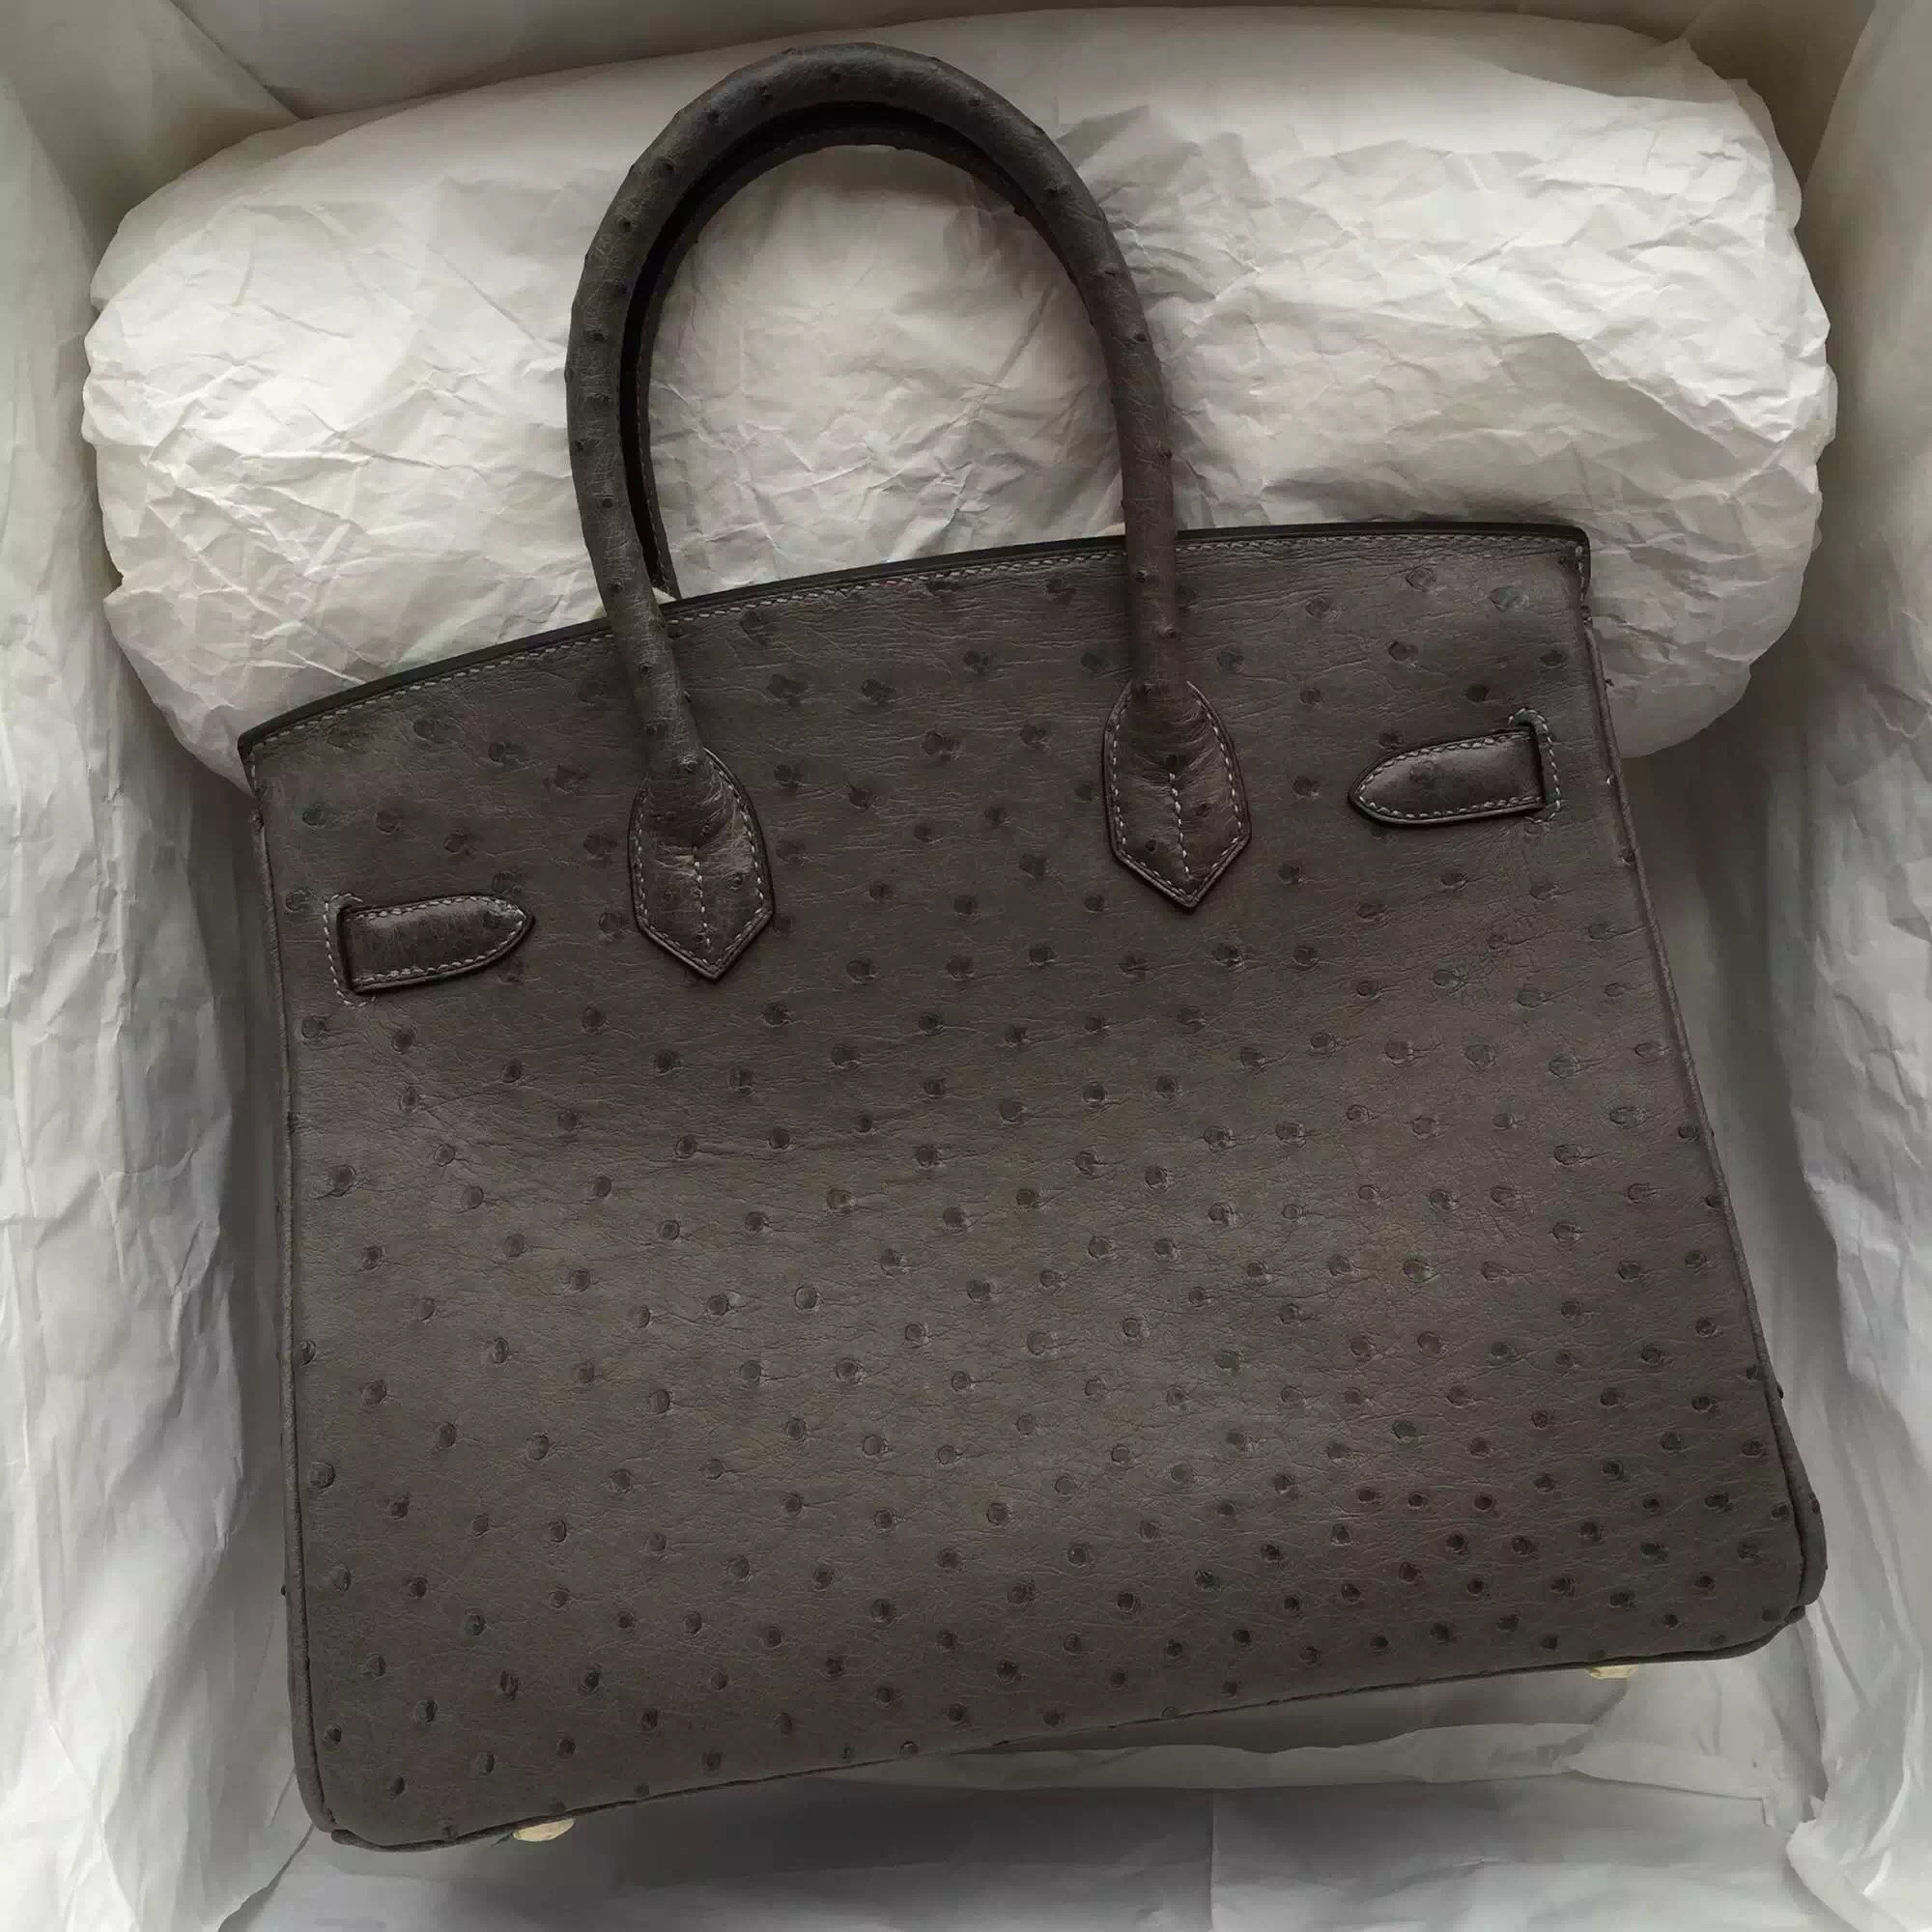 Discount Hermes Birkin 30CM in 8F Etain Grey Ostrich Leather Elegant Ladies' Tote Bag